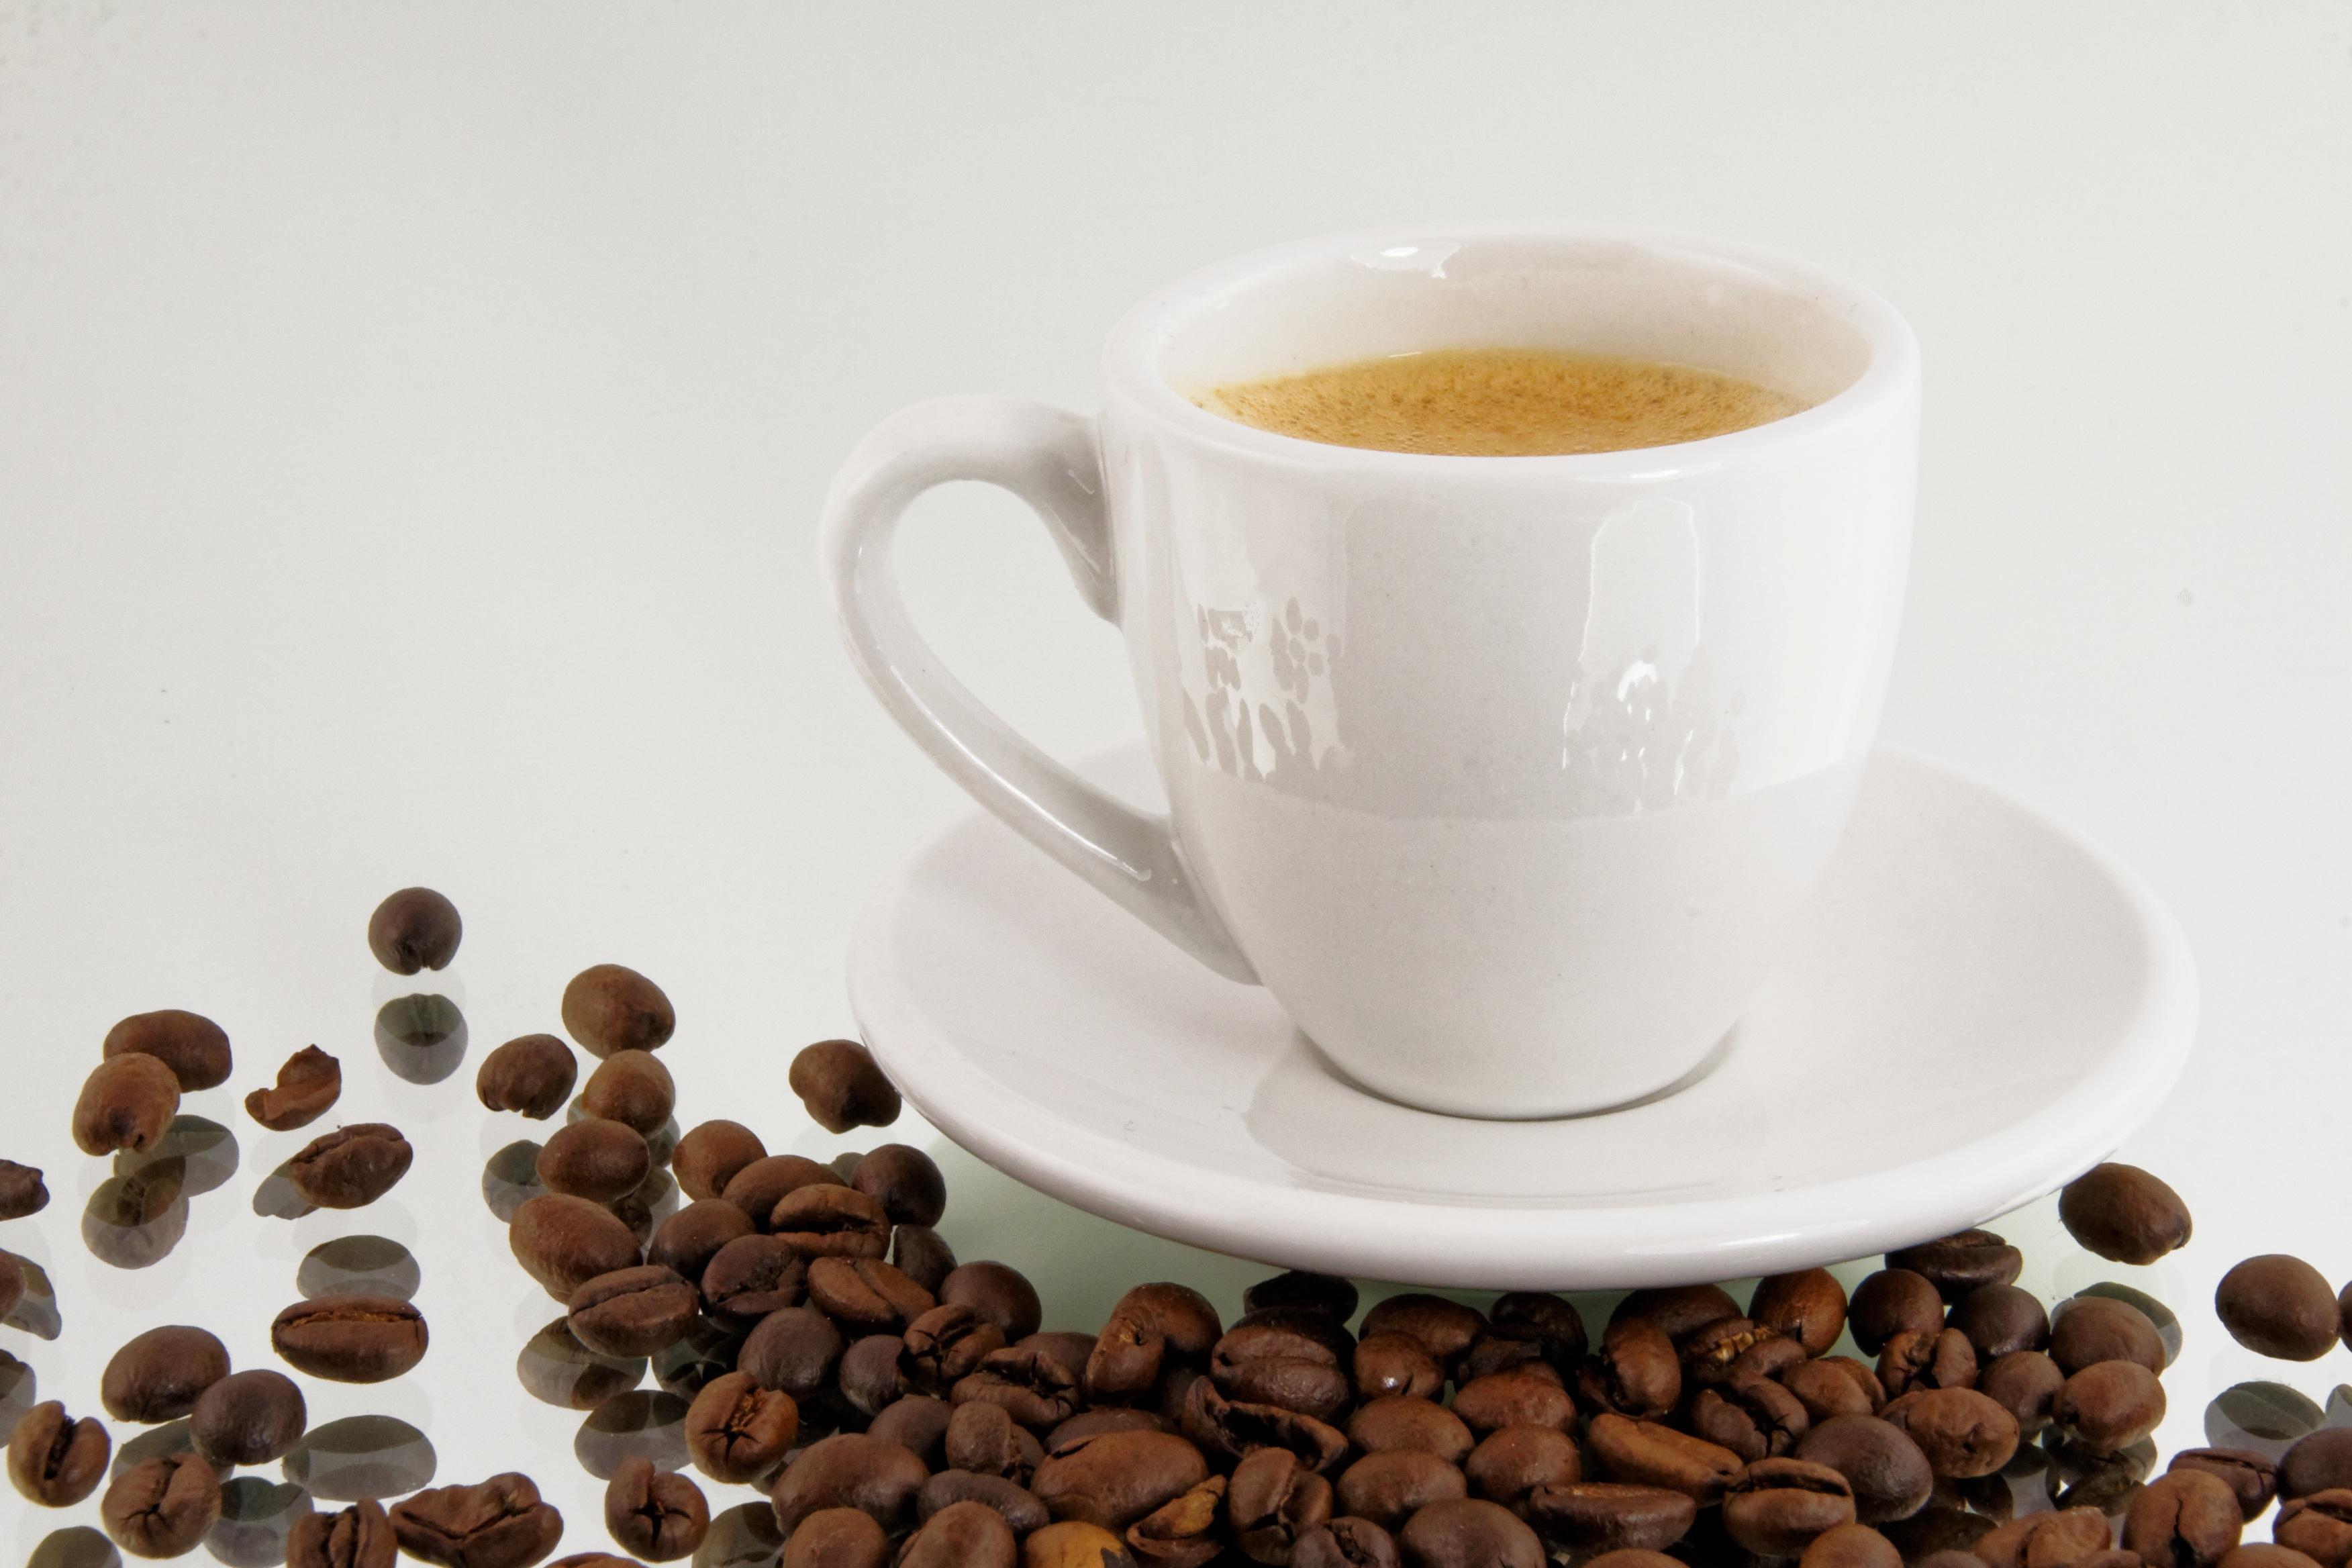 Kostenlose foto : Tasse, Latté, Cappuccino, Getränk, Espresso ...